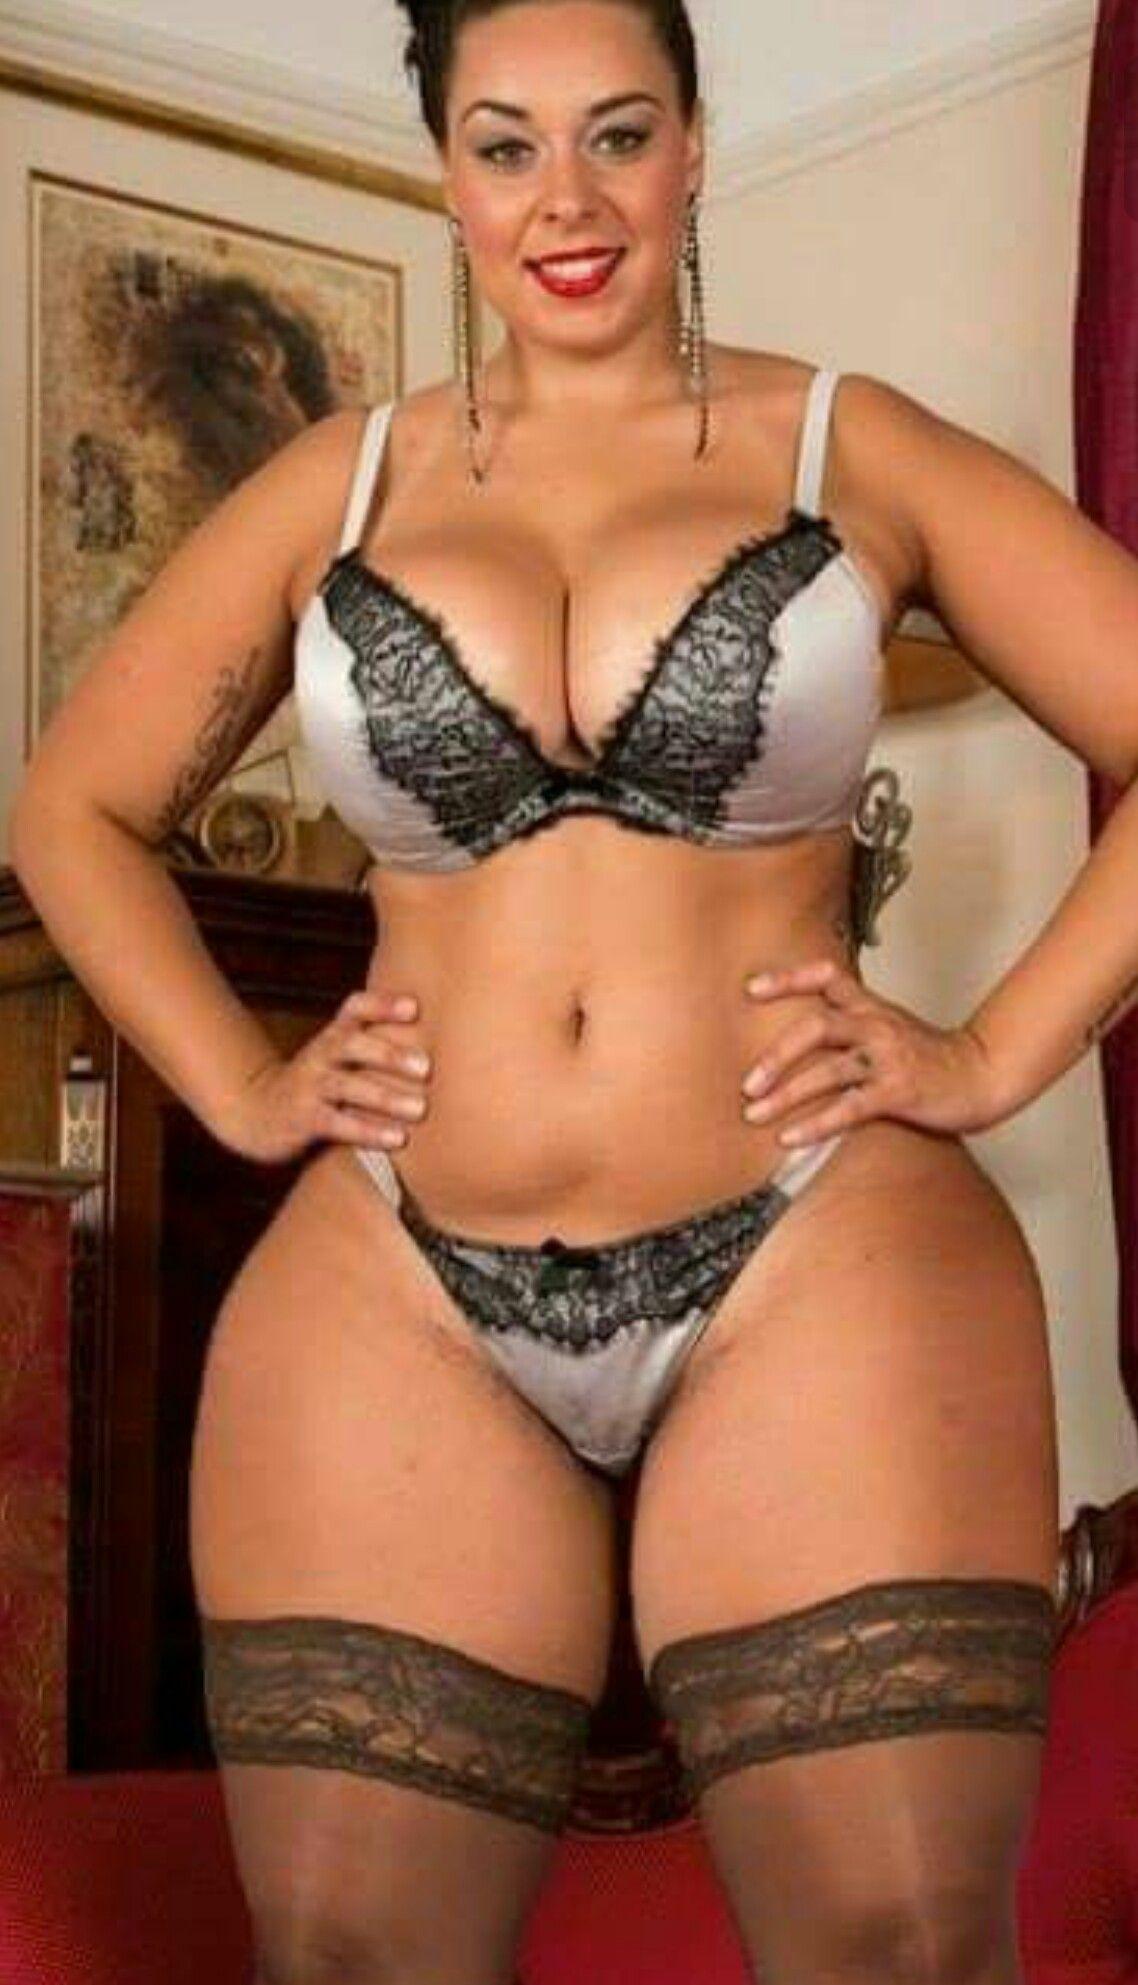 Hot anal goth girls pics